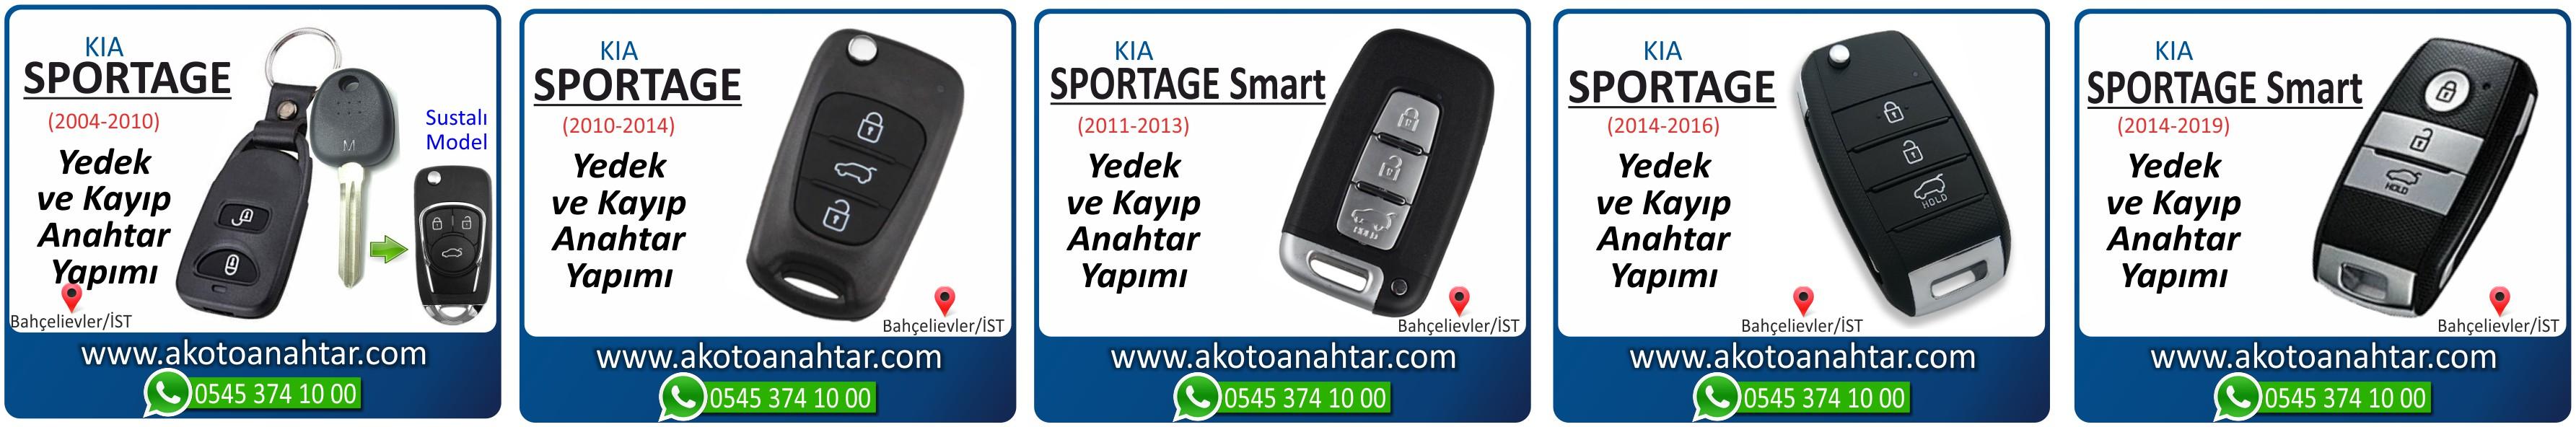 kia sportage anahtari - Sportage Smart Anahtarı | Yedek ve Kayıp Anahtar Yapımı